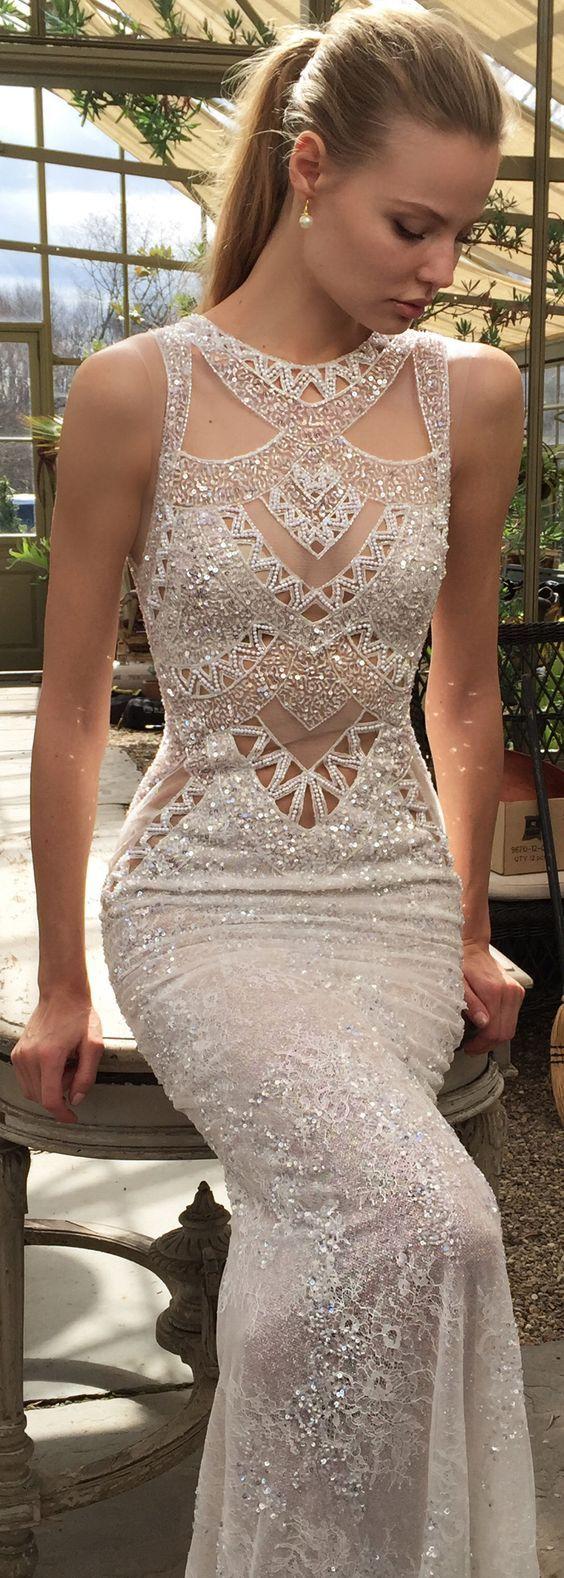 best wedding dresses images on pinterest wedding bridesmaid